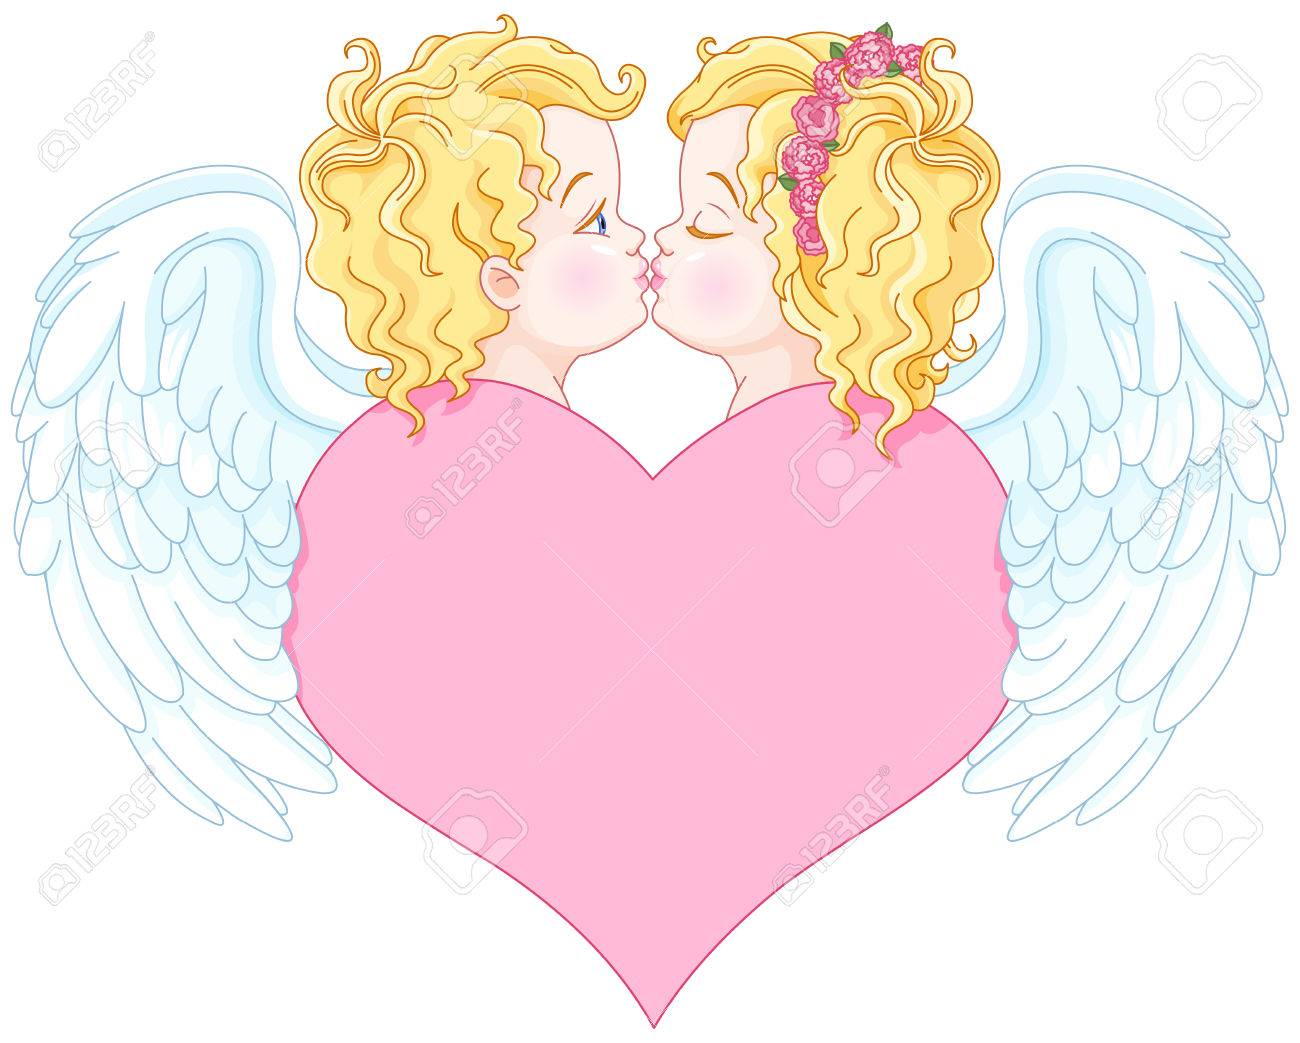 Dating-Engel